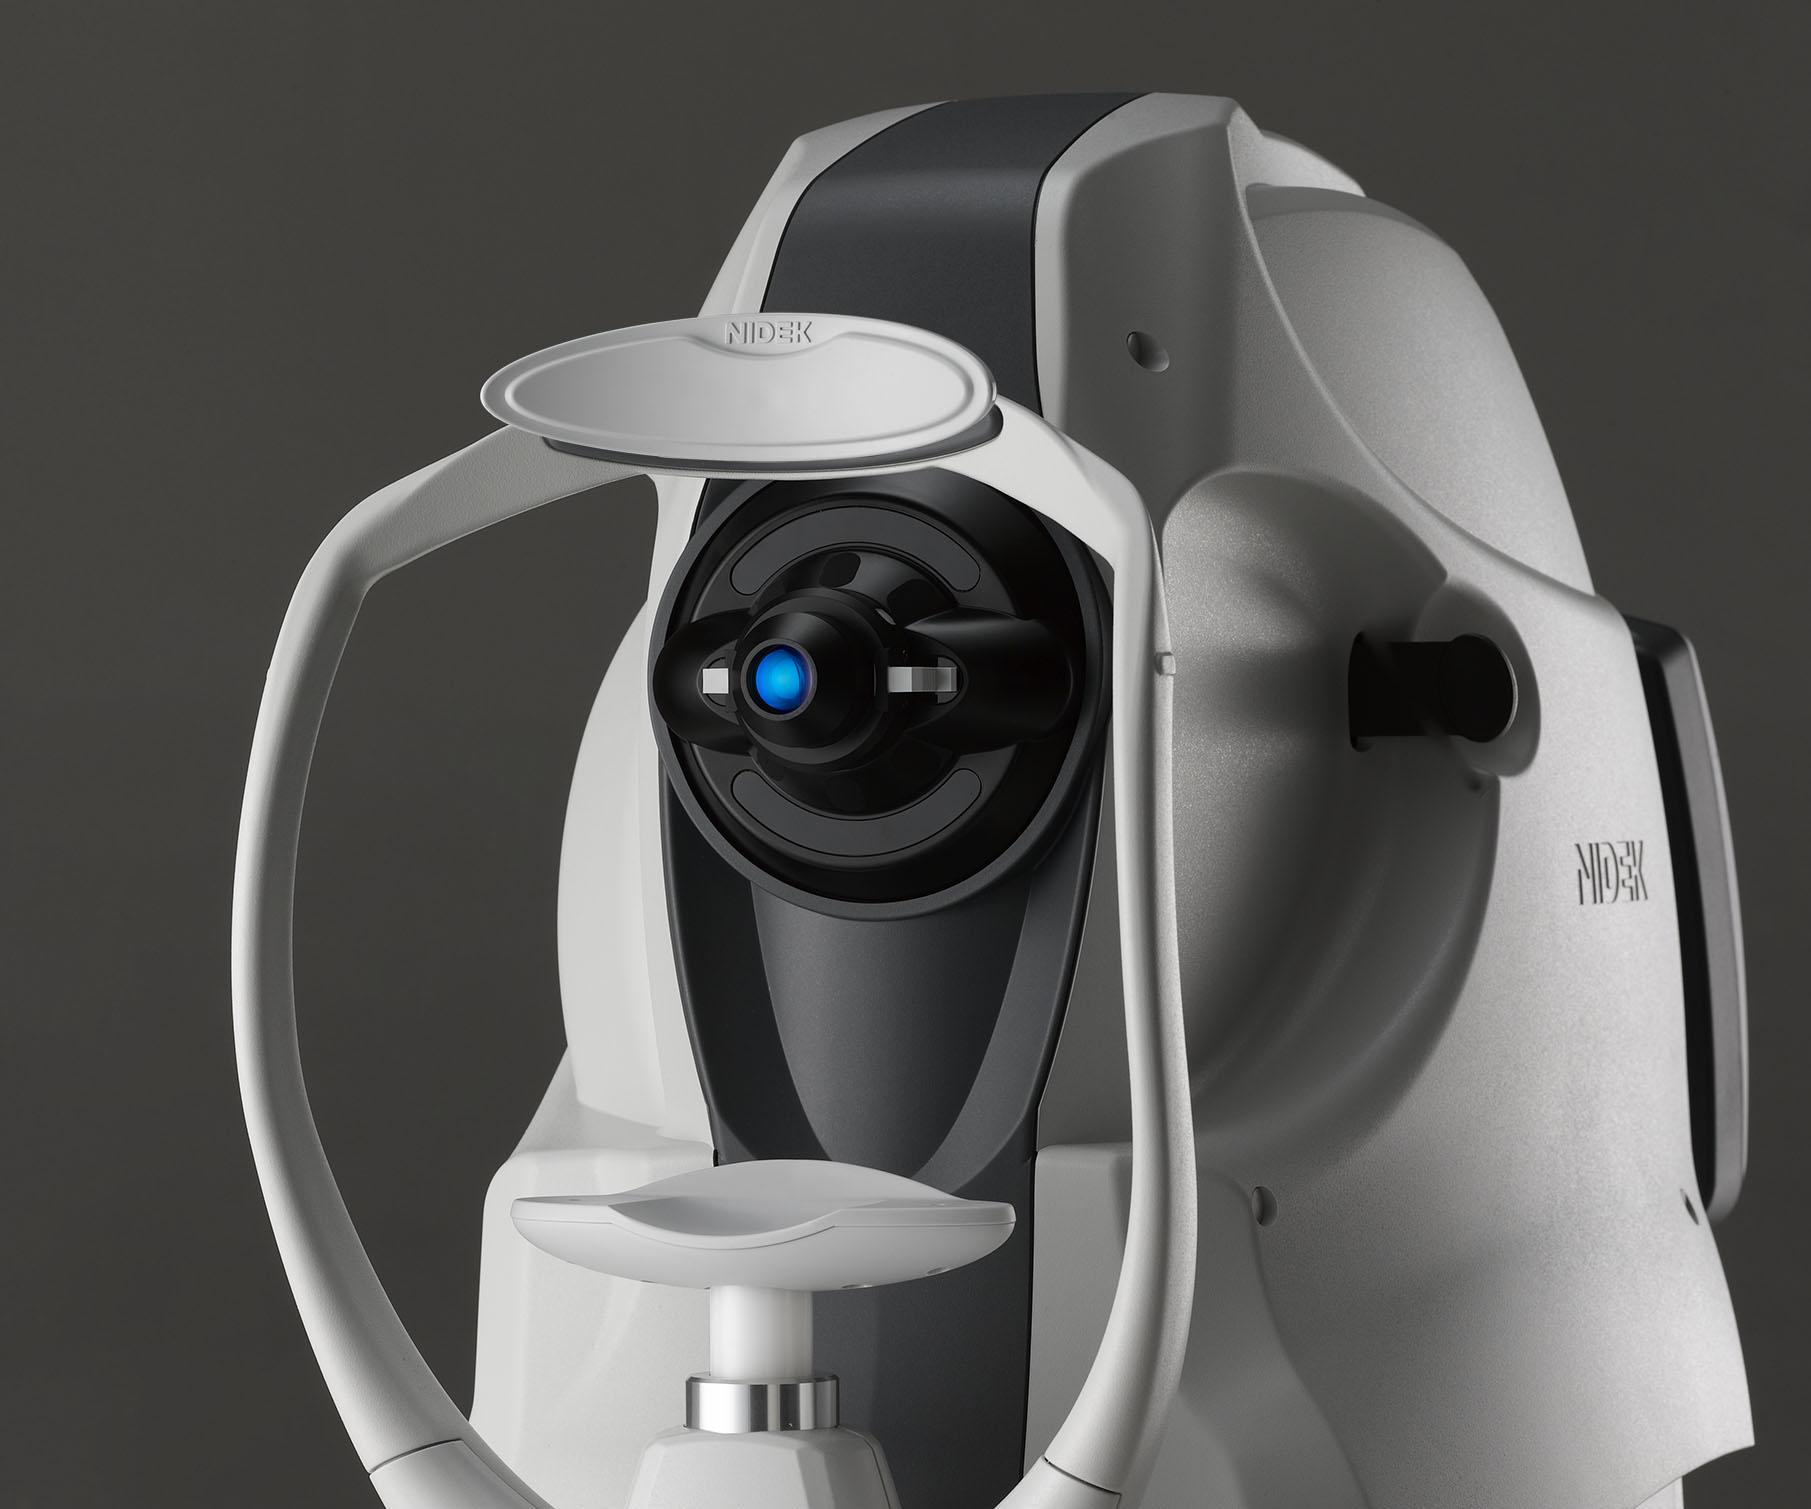 https://www.lameris-group.nl/wp-content/uploads/2020/03/Nidek-Optical-Coherence-Tomography-Retina-Scan-Duo-RS-330-3.jpg